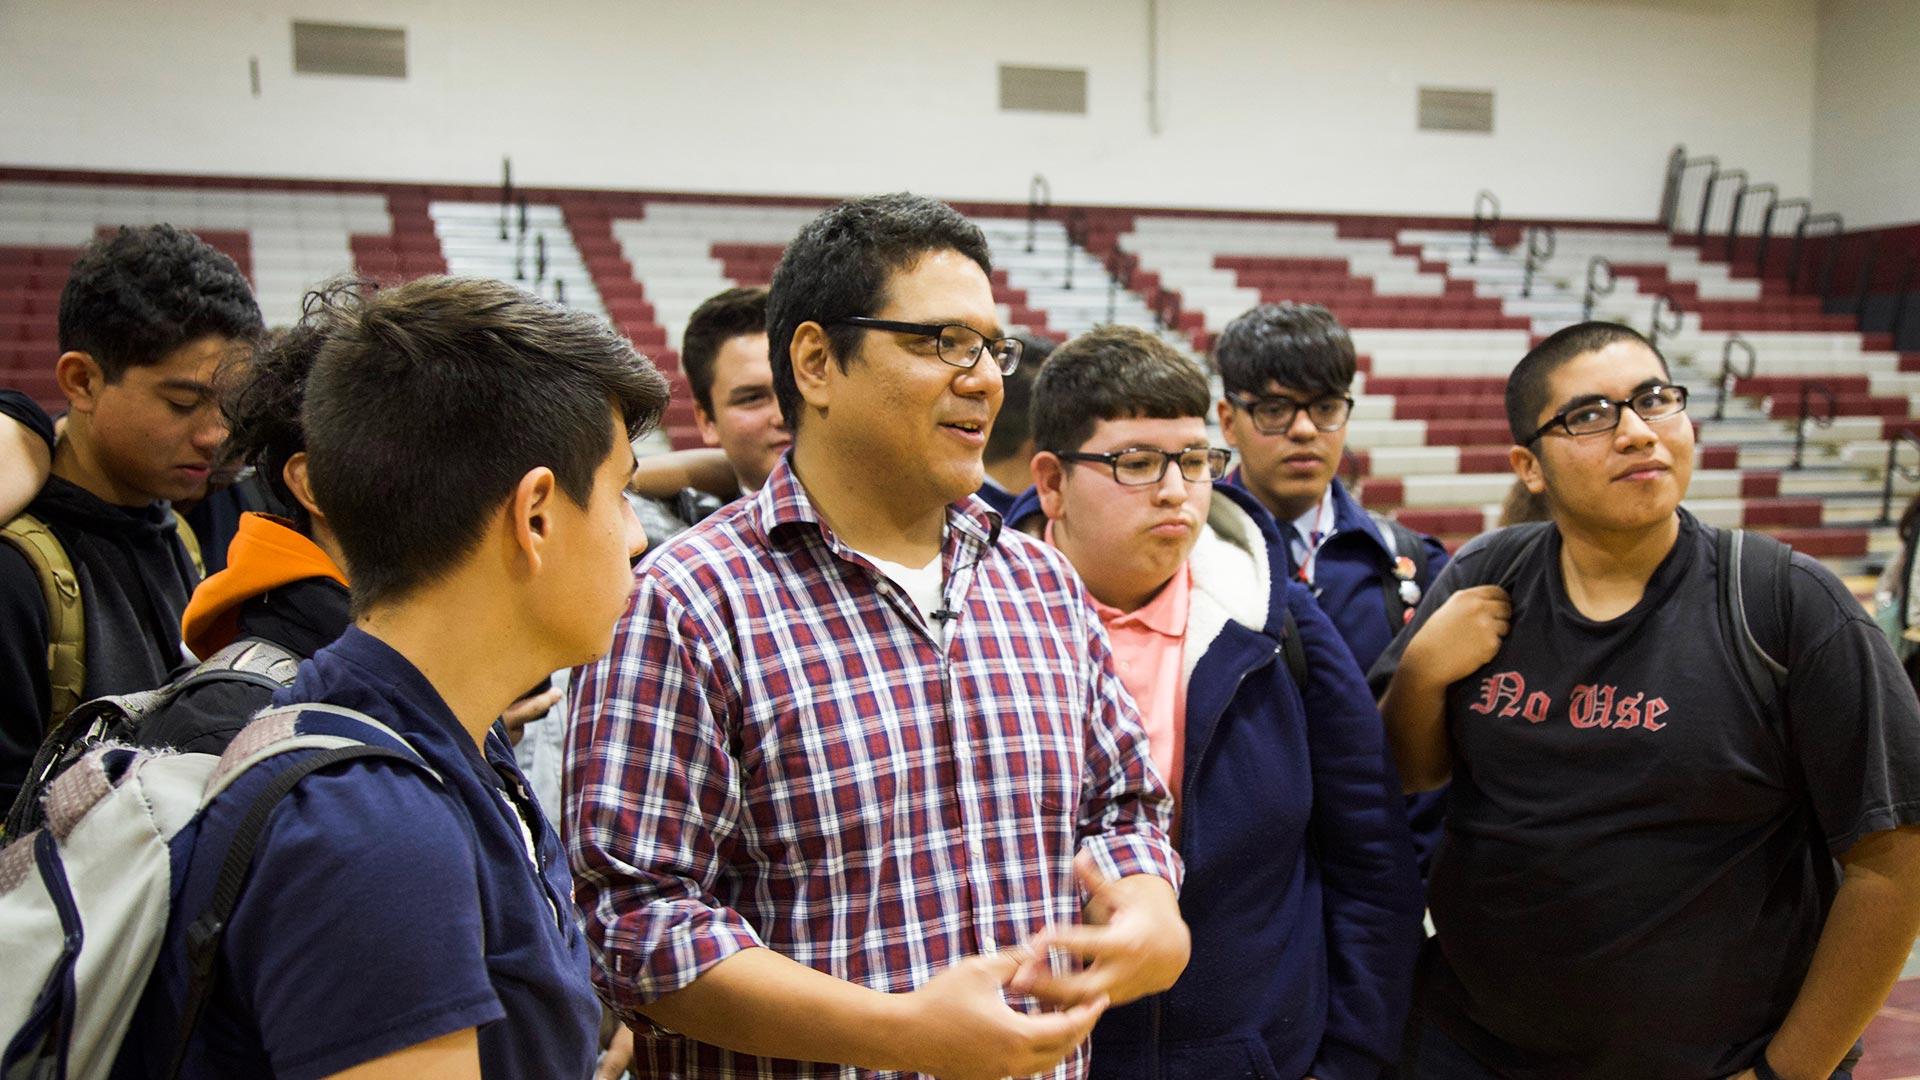 Cadena students view larger